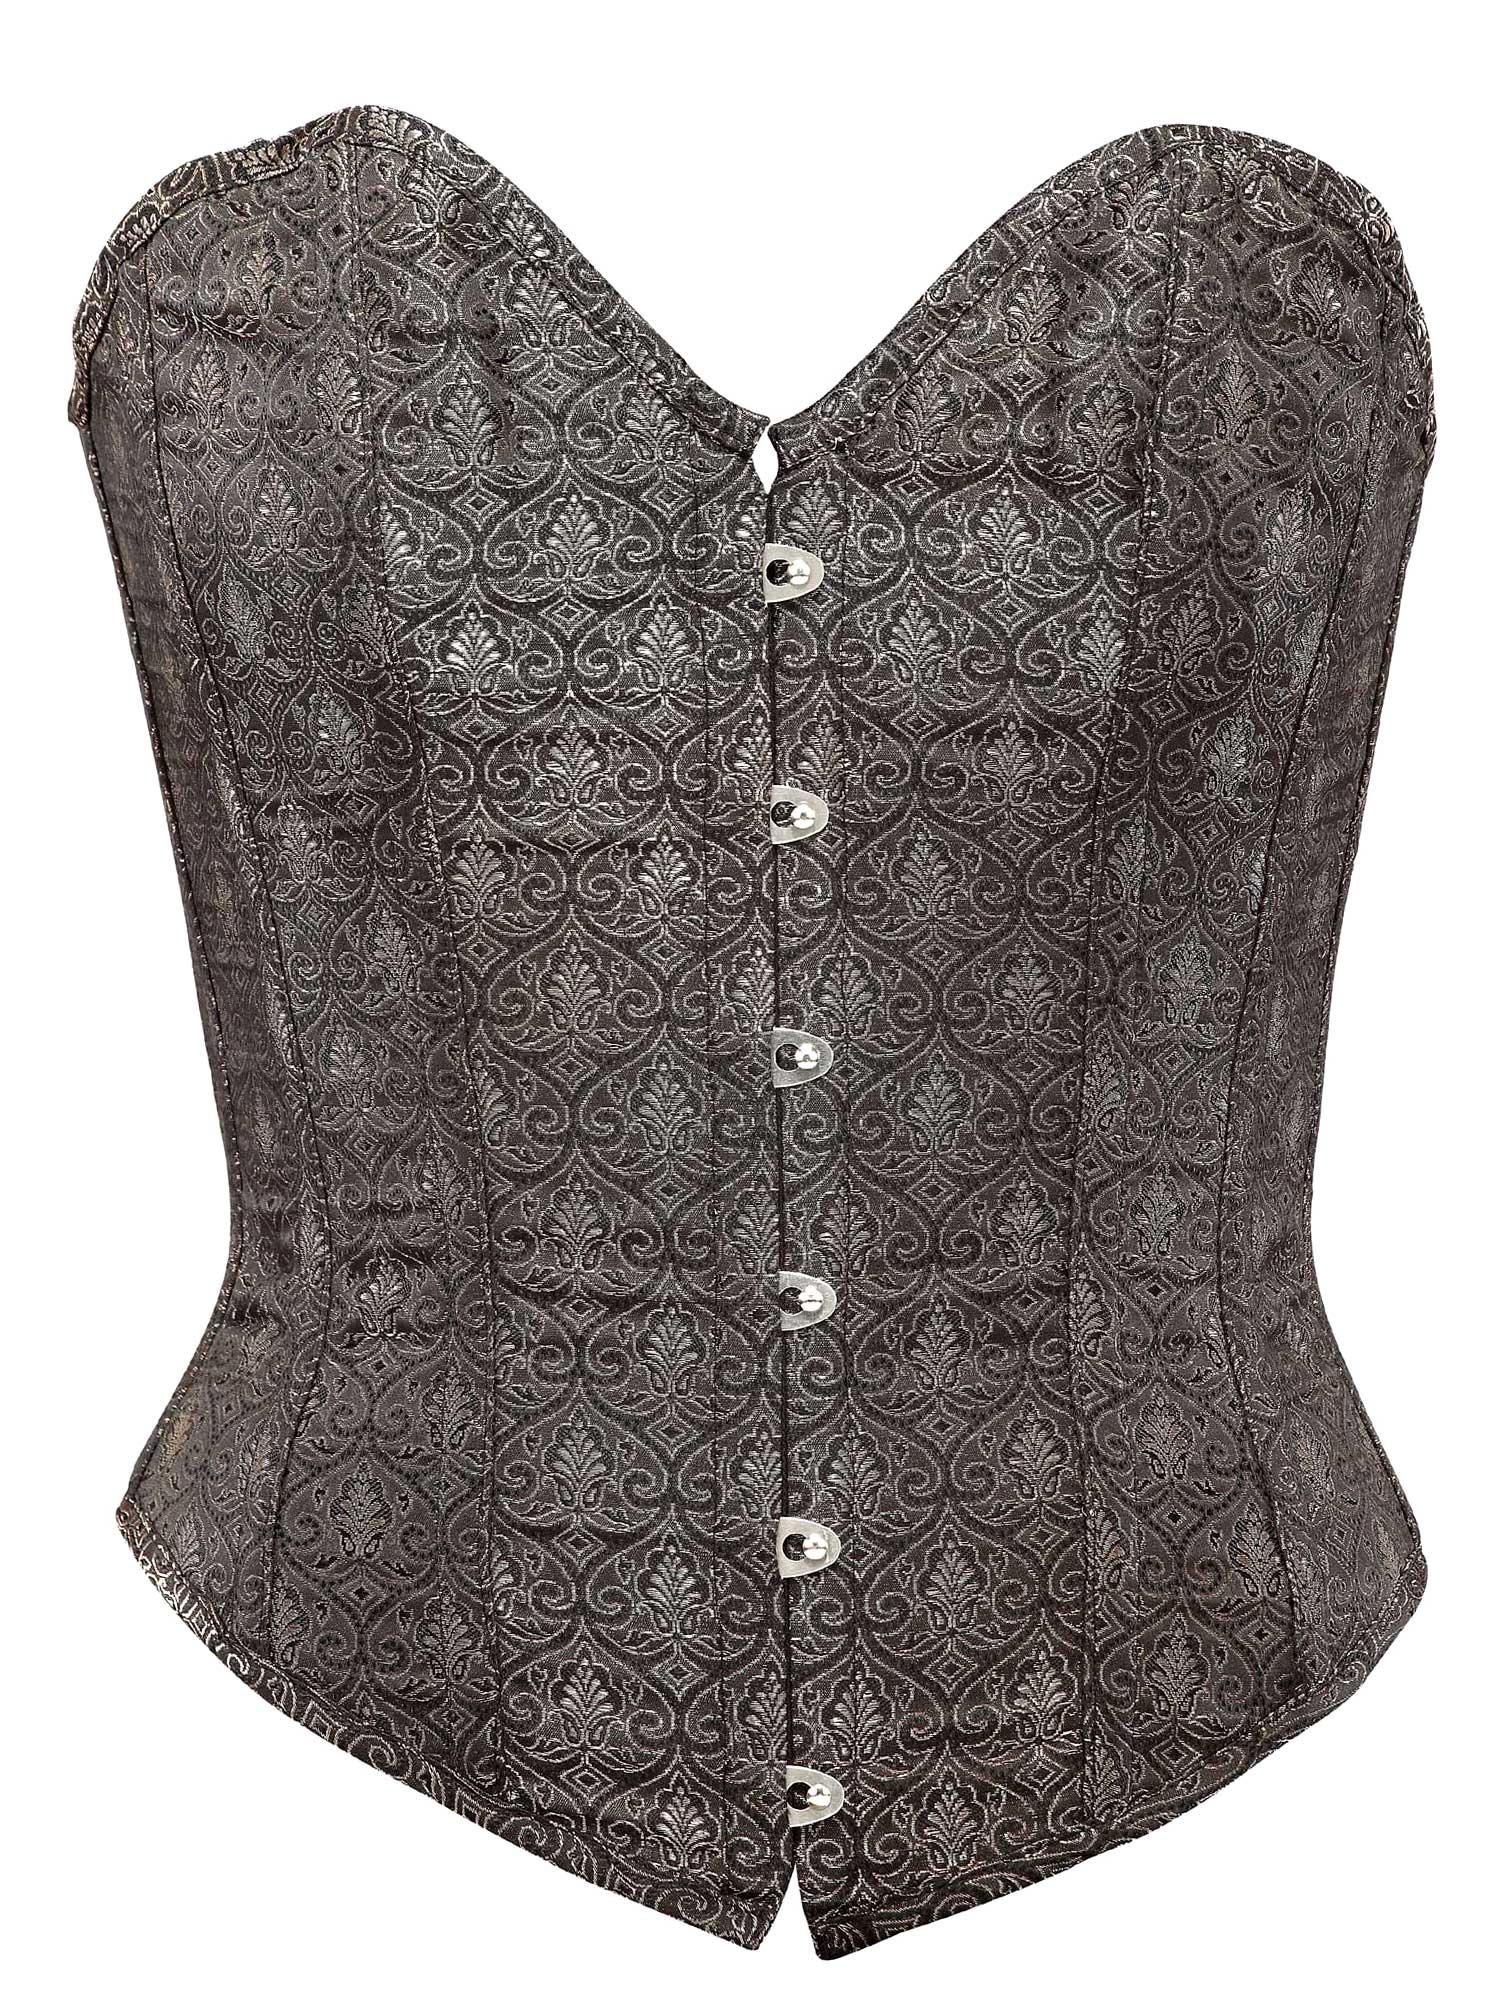 brown_brocade_fabric_steel_boning_corset_waist_cincher_bustier_bustiers_and_corsets_5.jpg